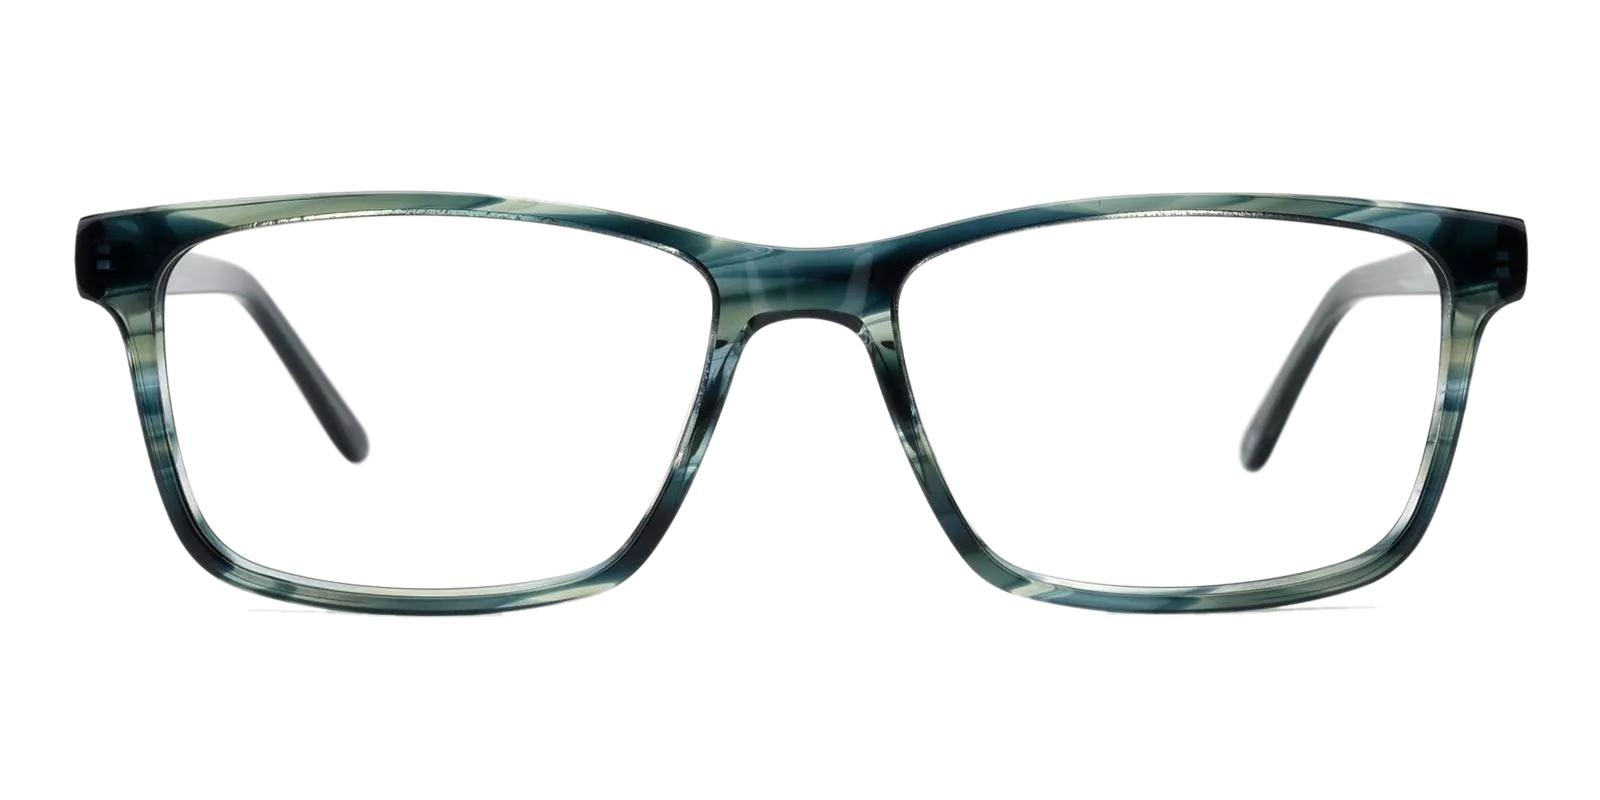 Moment Green Acetate Eyeglasses , Fashion , SpringHinges , UniversalBridgeFit Frames from ABBE Glasses